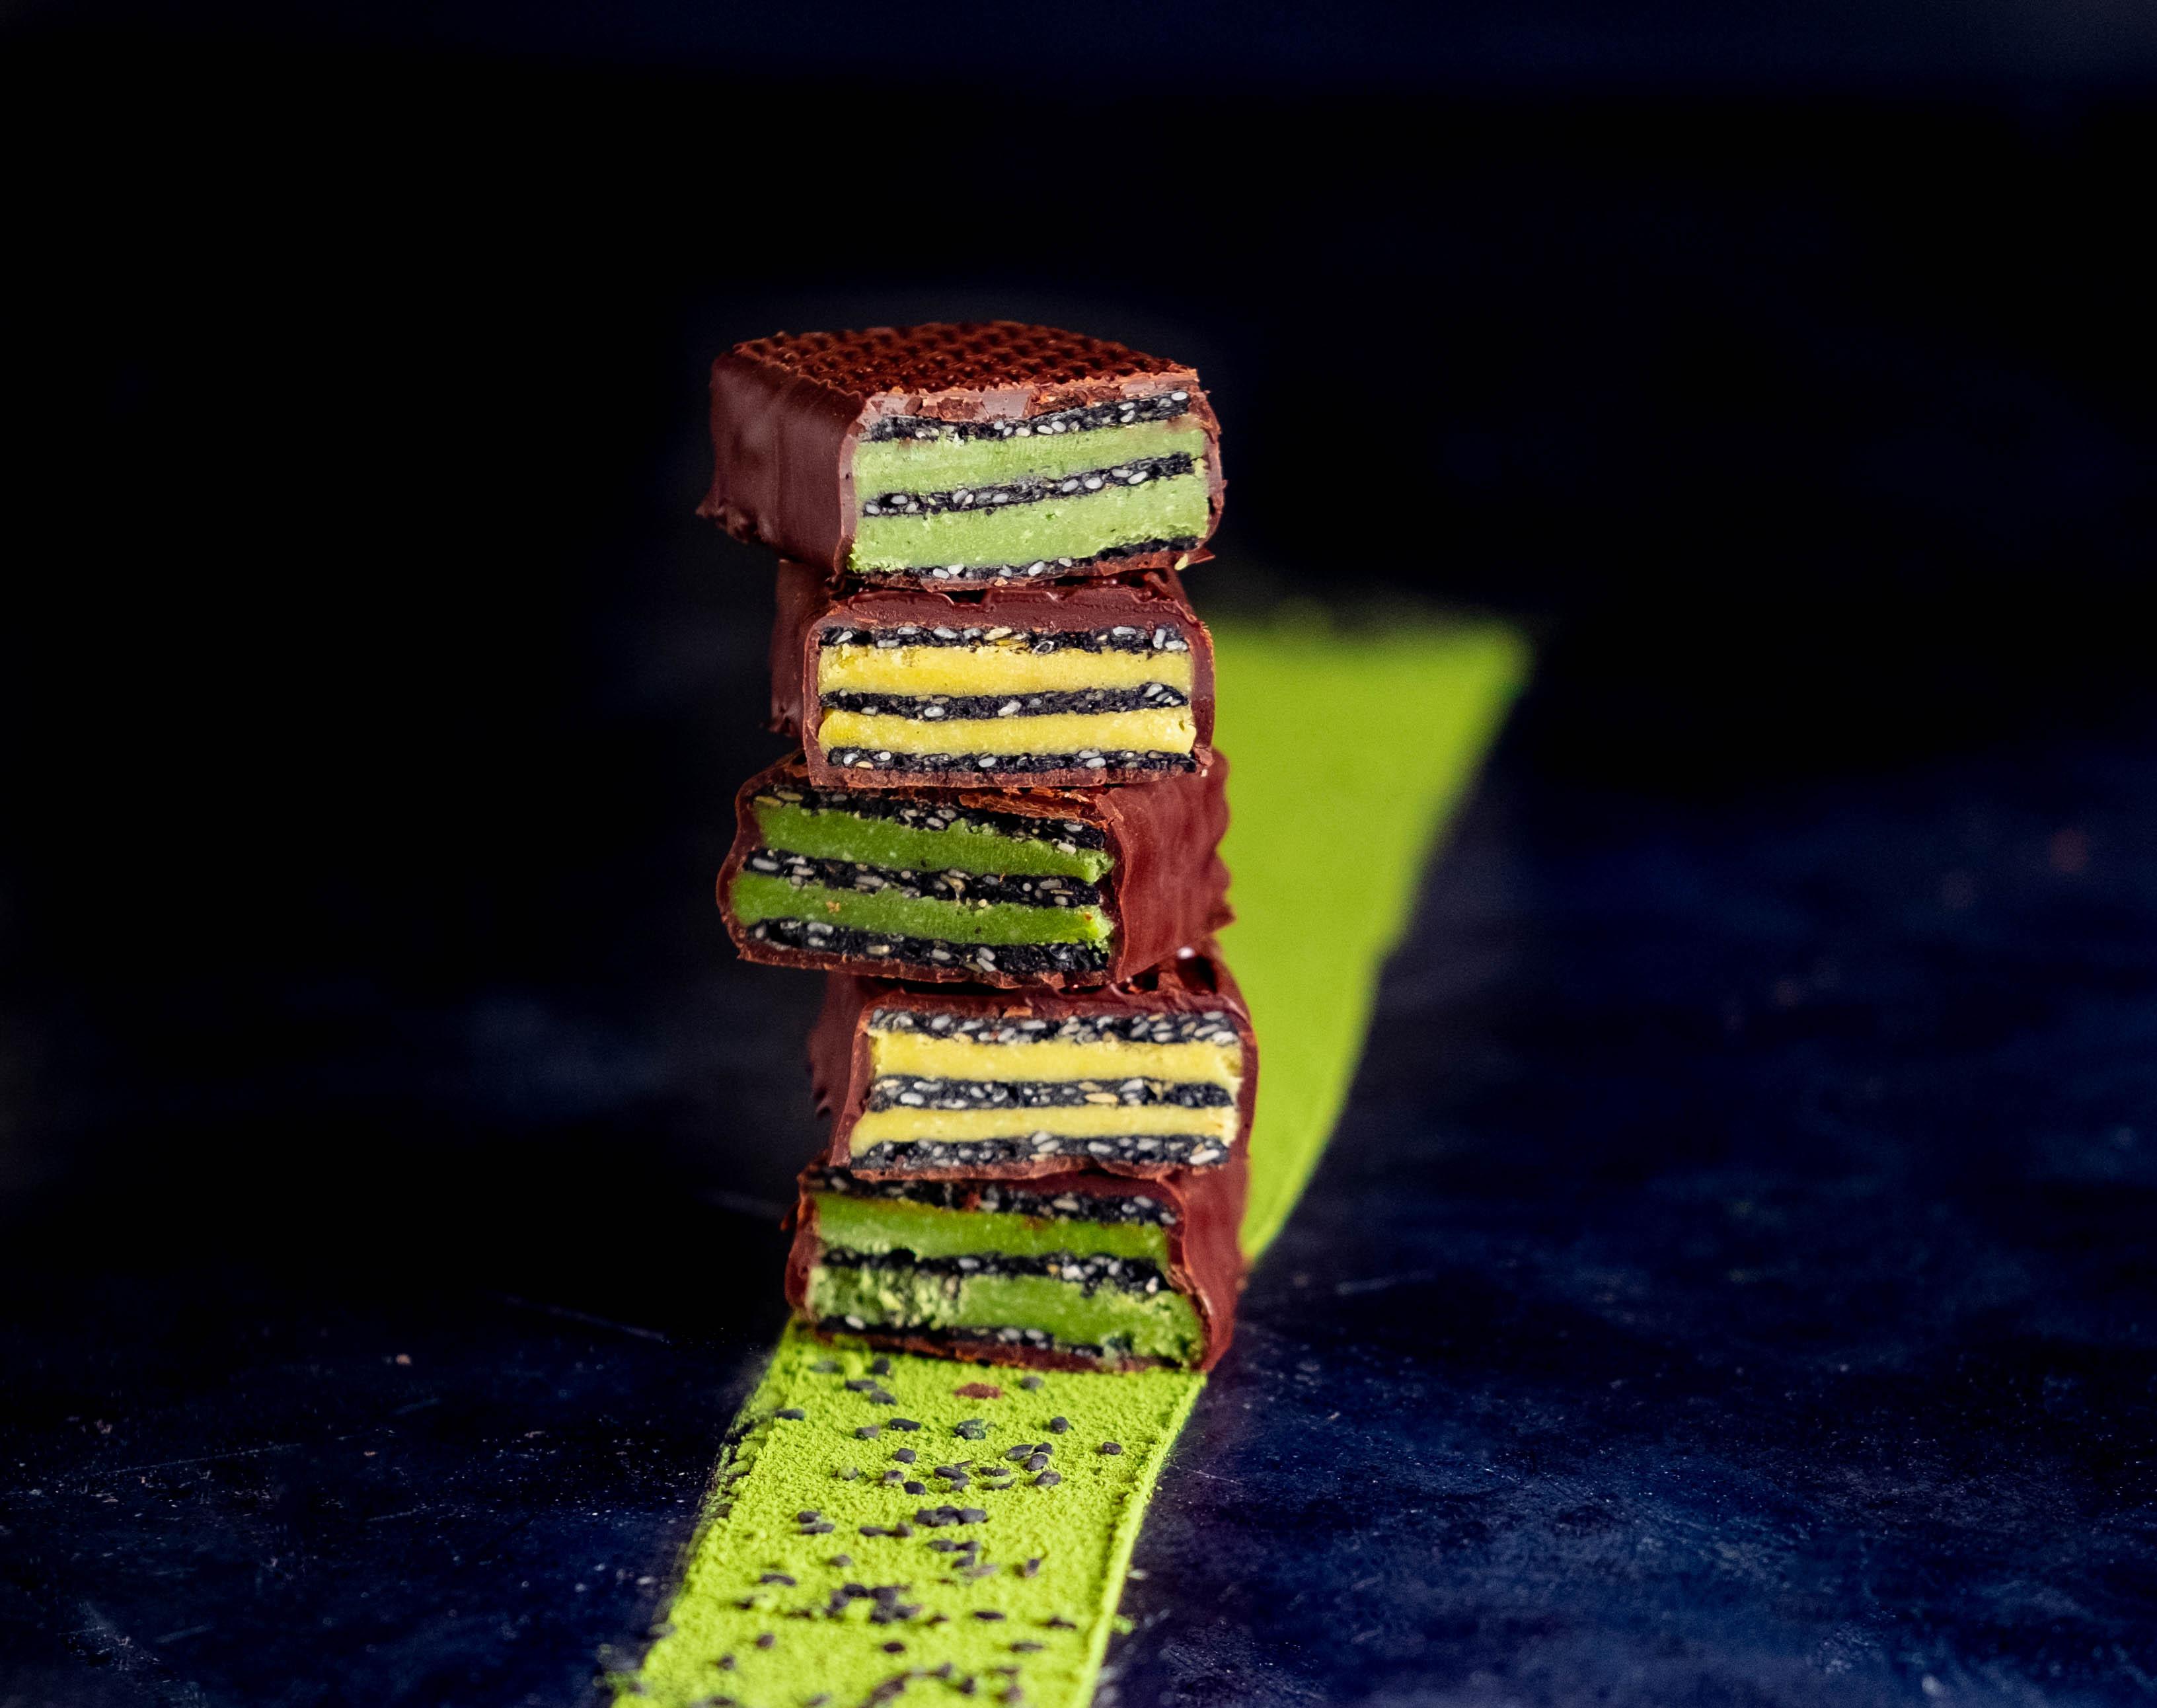 Black Sesame Matcha & Passion Fruit Candy Bars